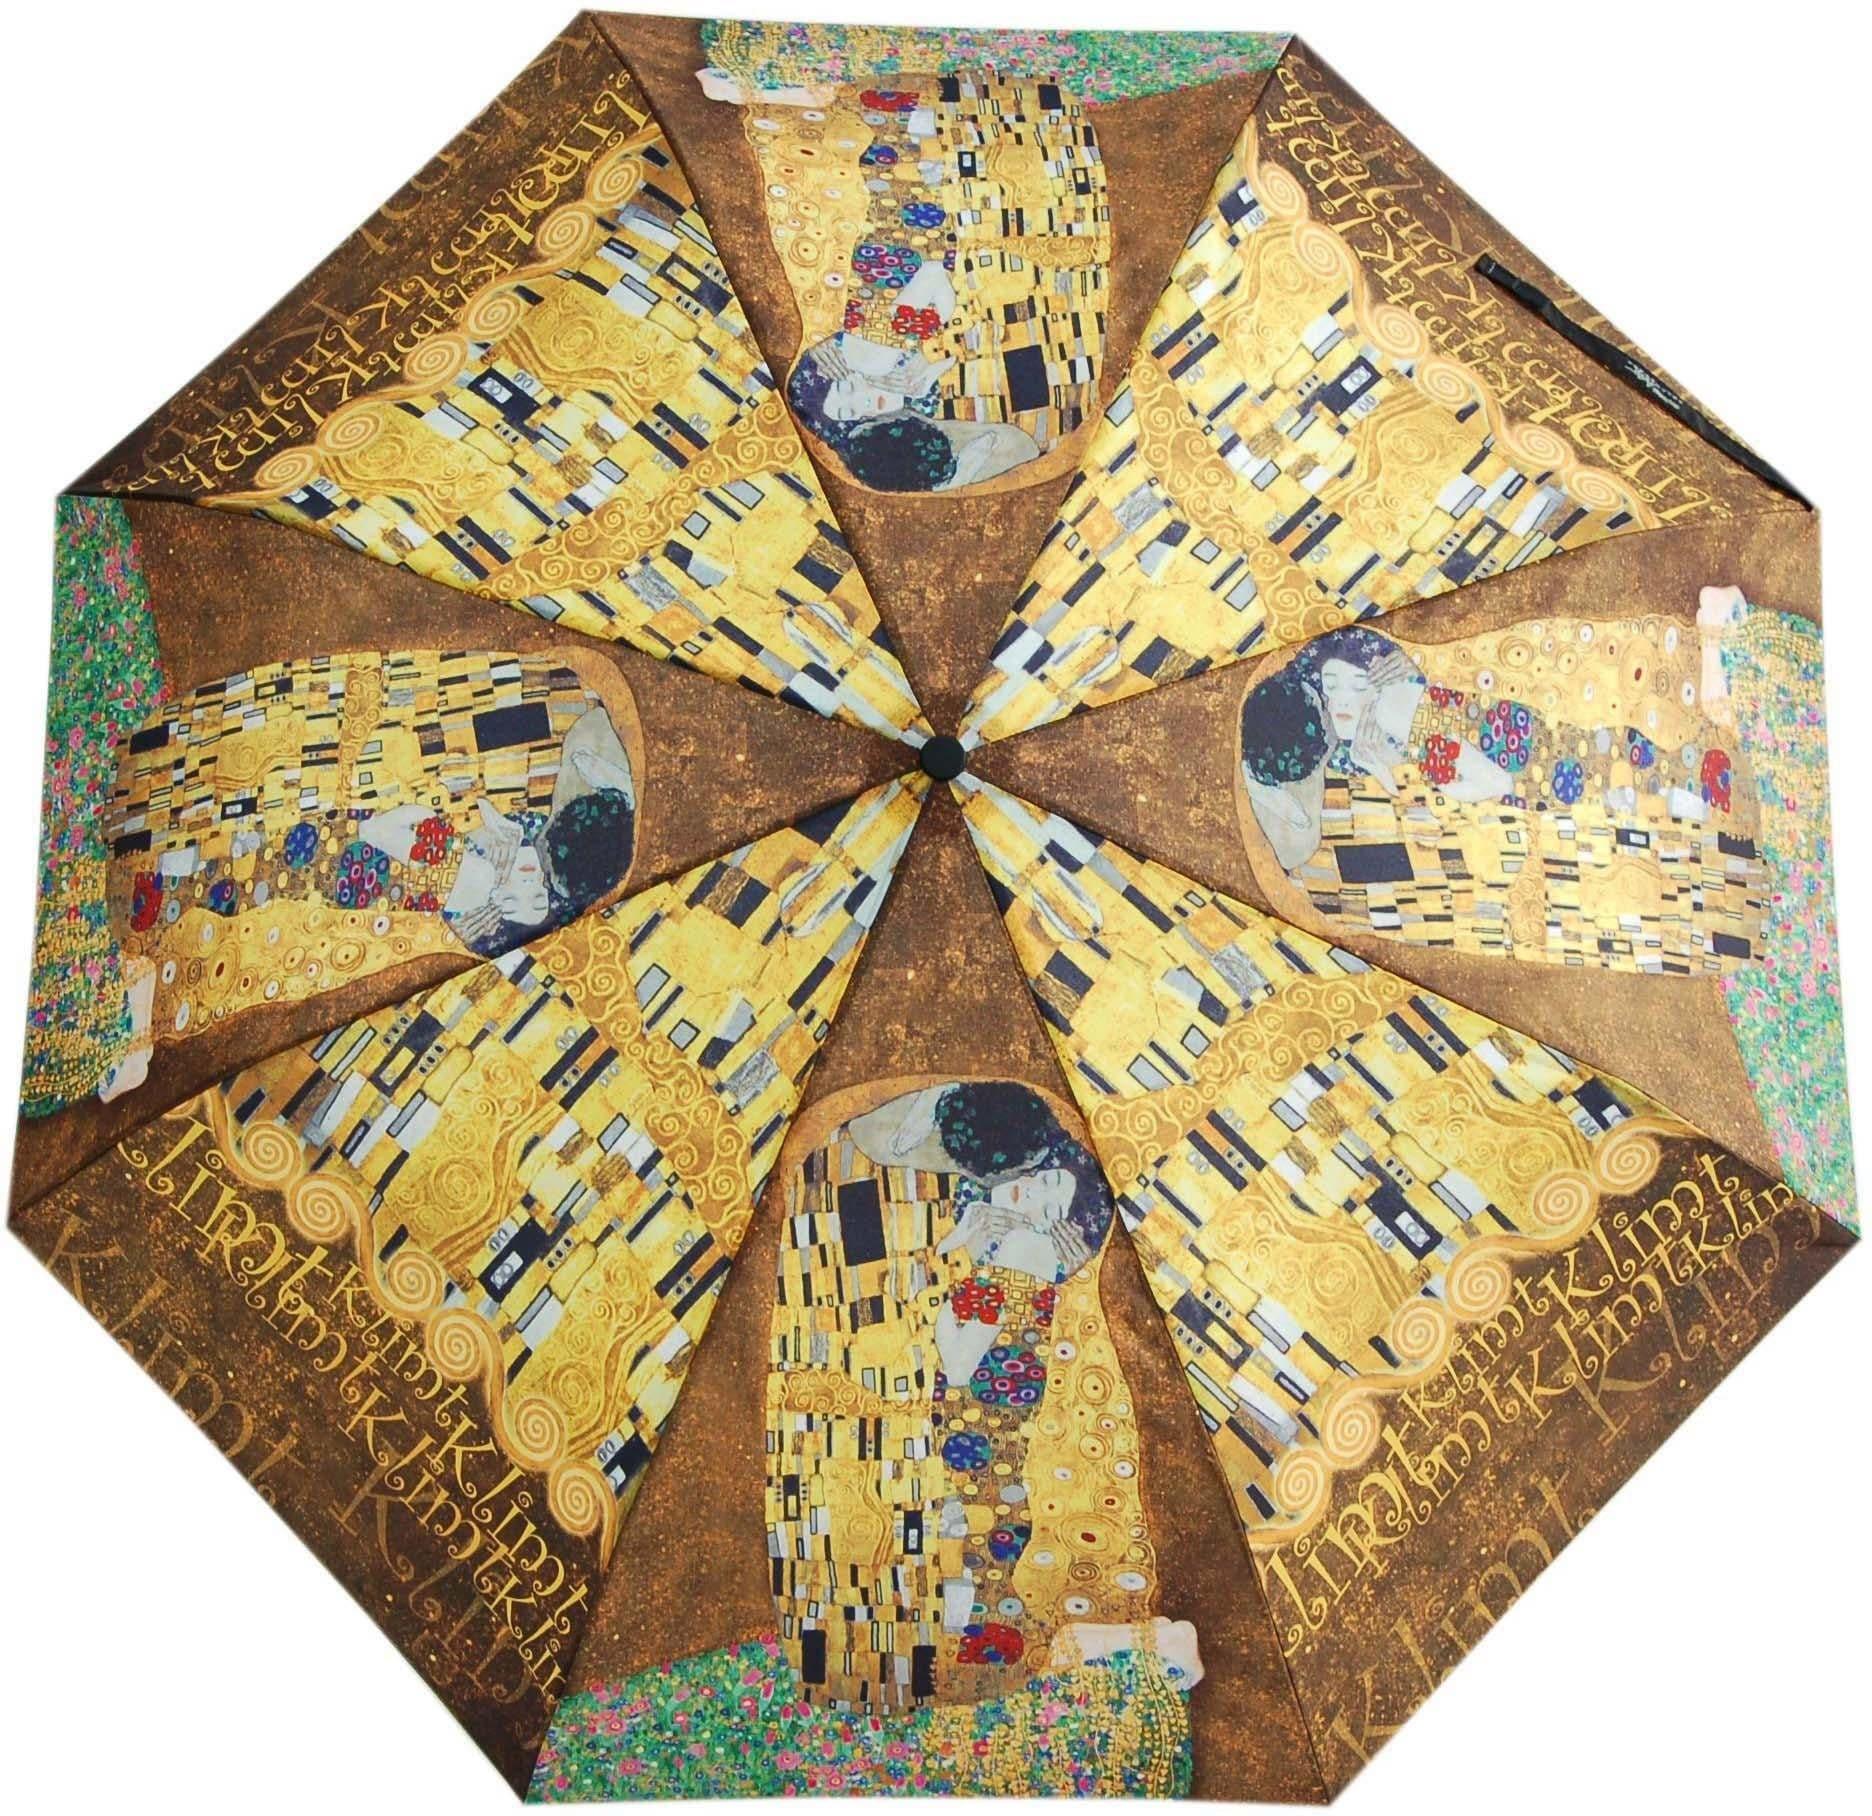 "doppler Taschenregenschirm ""Art Collection Magic Mini Klimt Der Kuss"" Damenmode/Schmuck & Accessoires/Accessoires/Regenschirme/Taschenschirme"